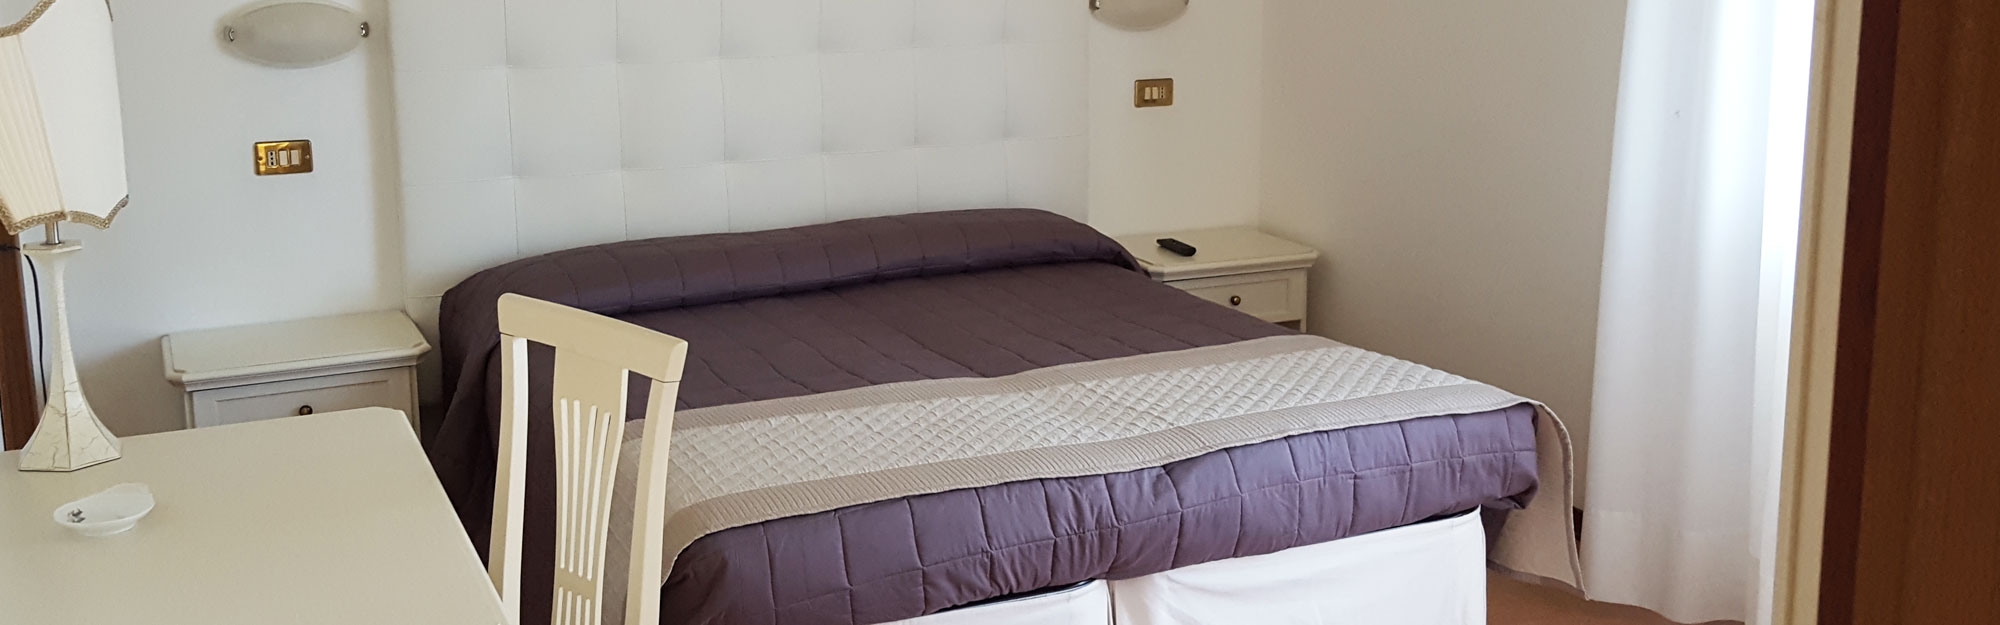 Camera Hotel Marilù Eraclea Mare